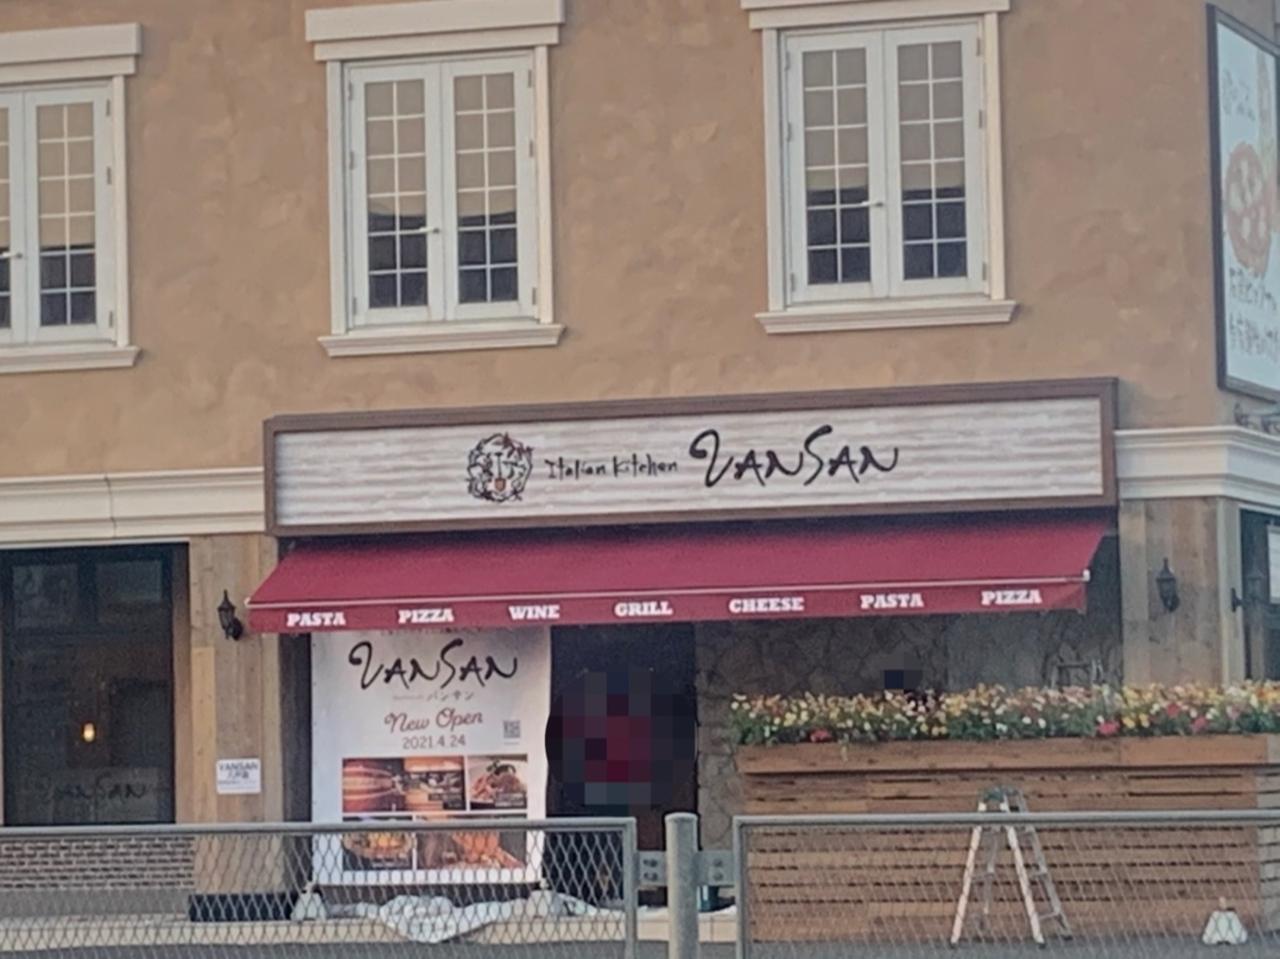 「Italian Kitchen VANSAN」 八戸店 21年4月24日オープン予定のようです。